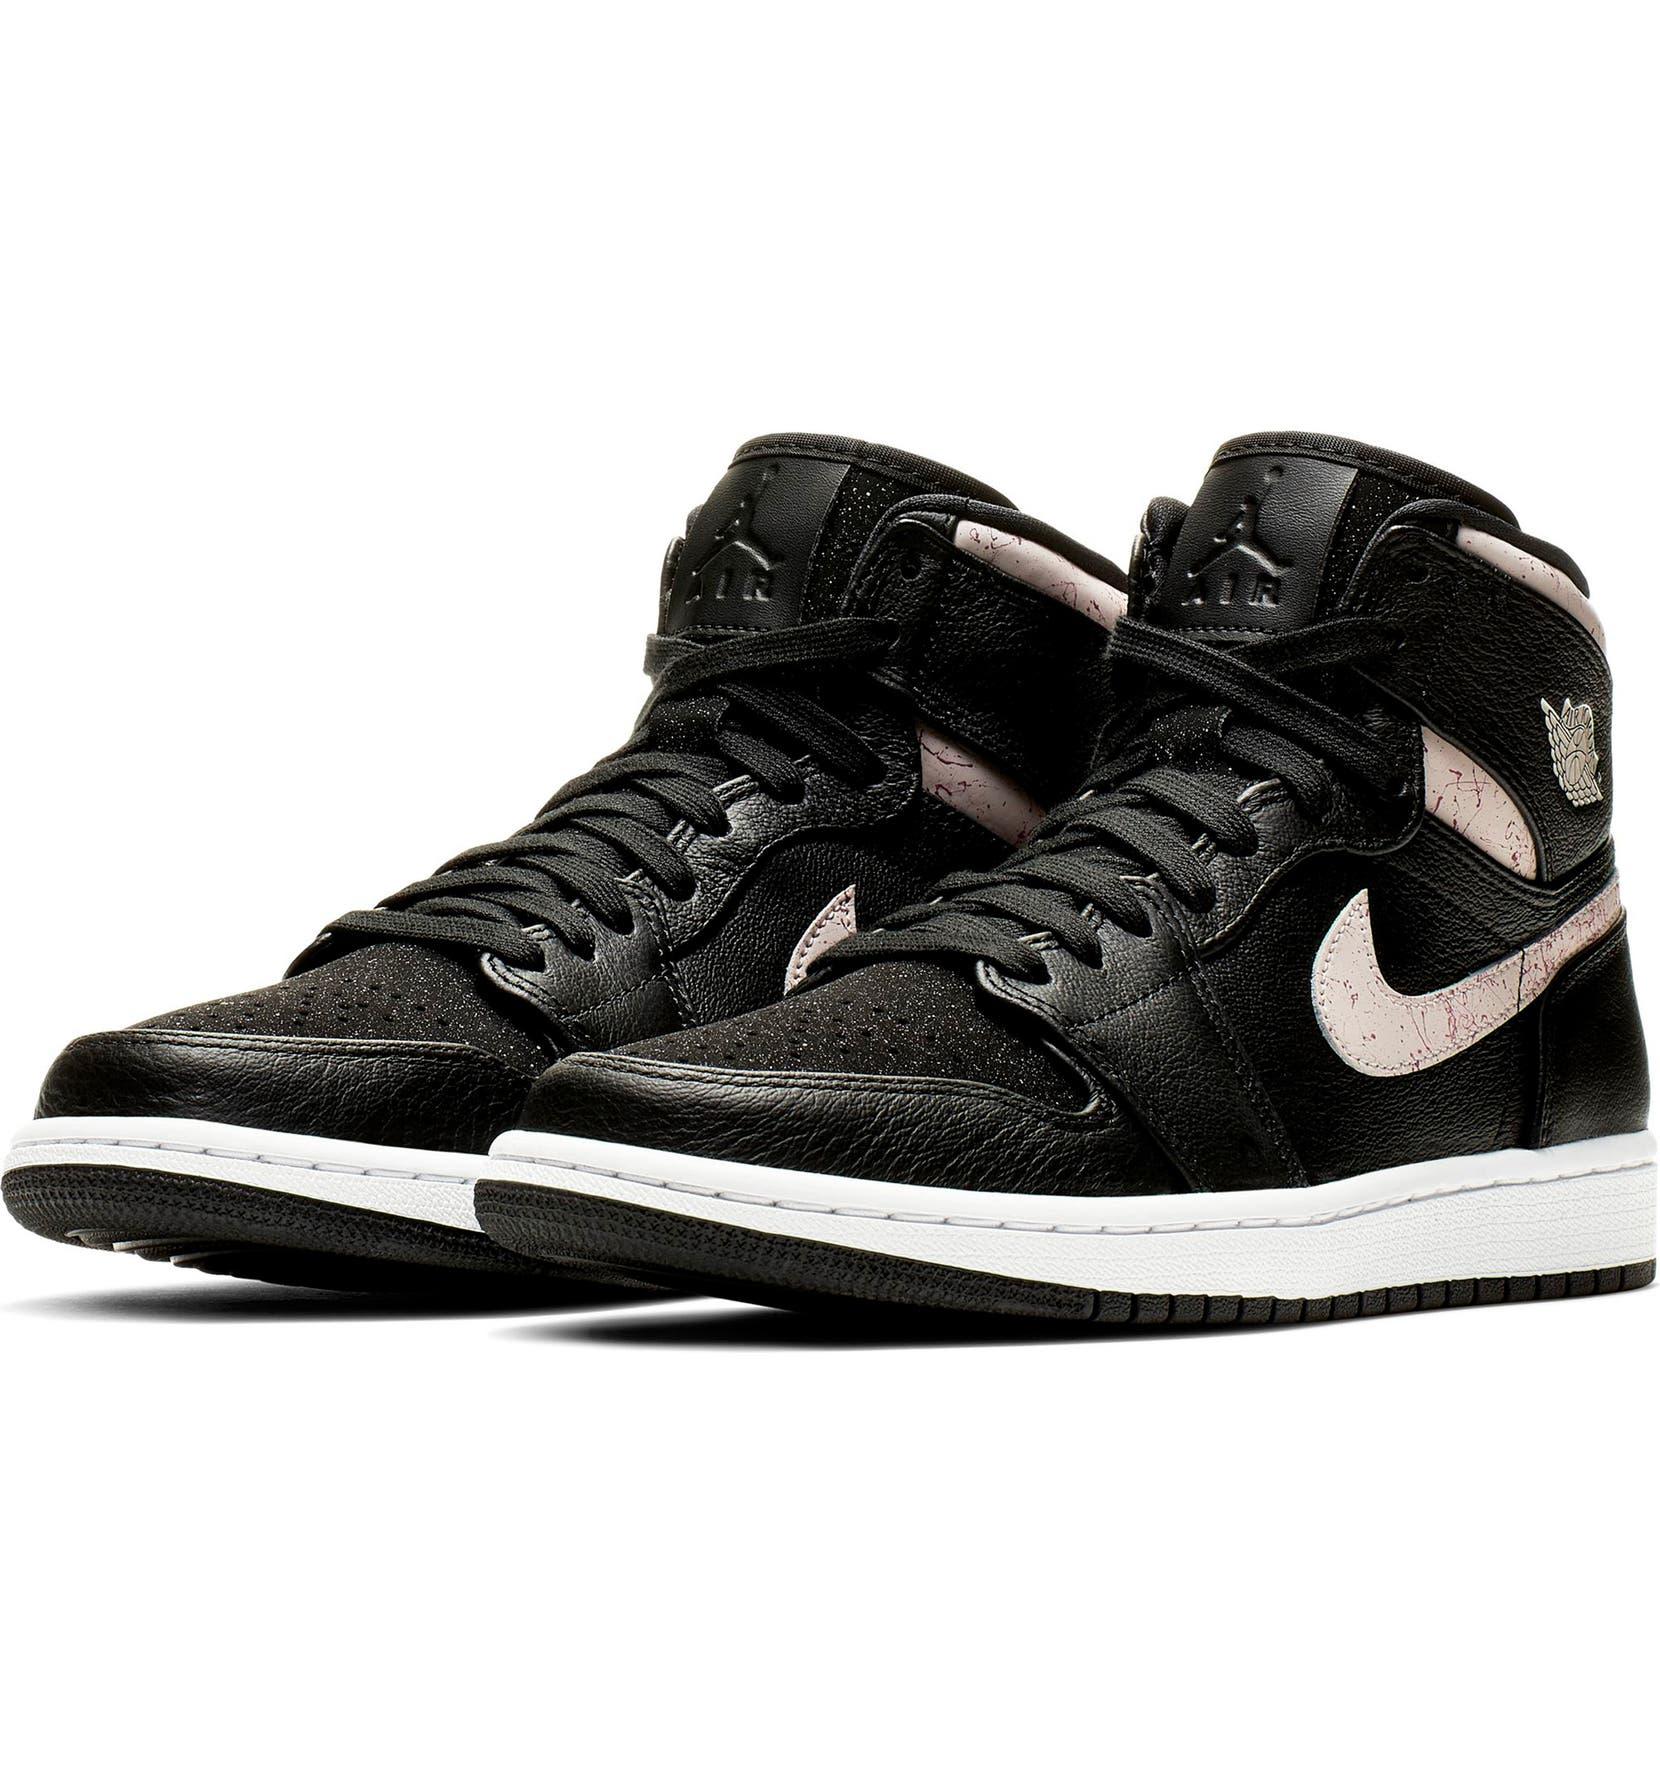 Nike Jordan Air Jordan 1 Retro Premium High Top Sneaker (Women ... fa2e07de5